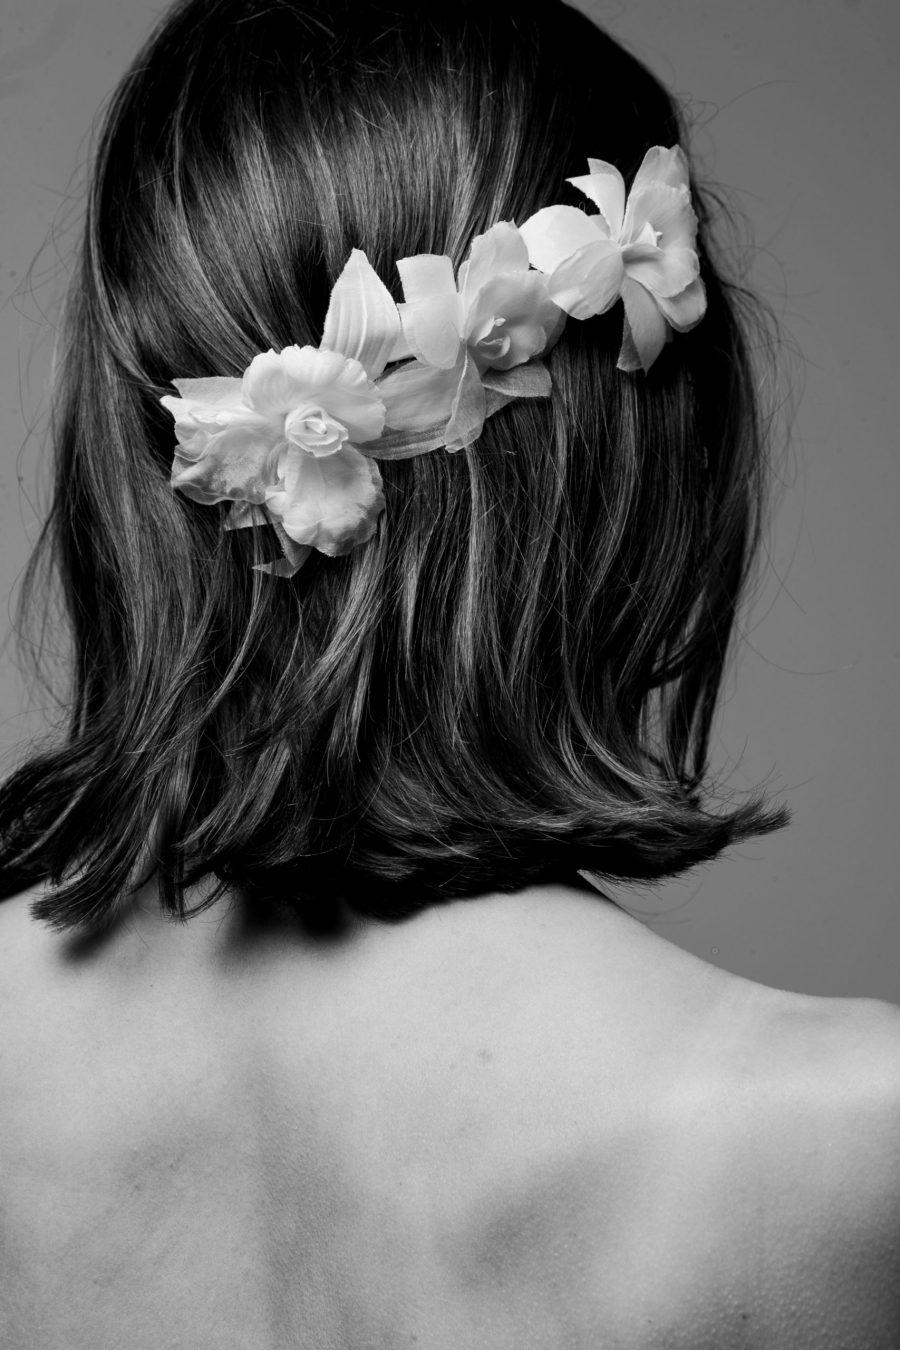 Luna bea bride, Luna Bea, hair accessories, bridal accessories, wedding accessories, wedding fashion, bridal fashion